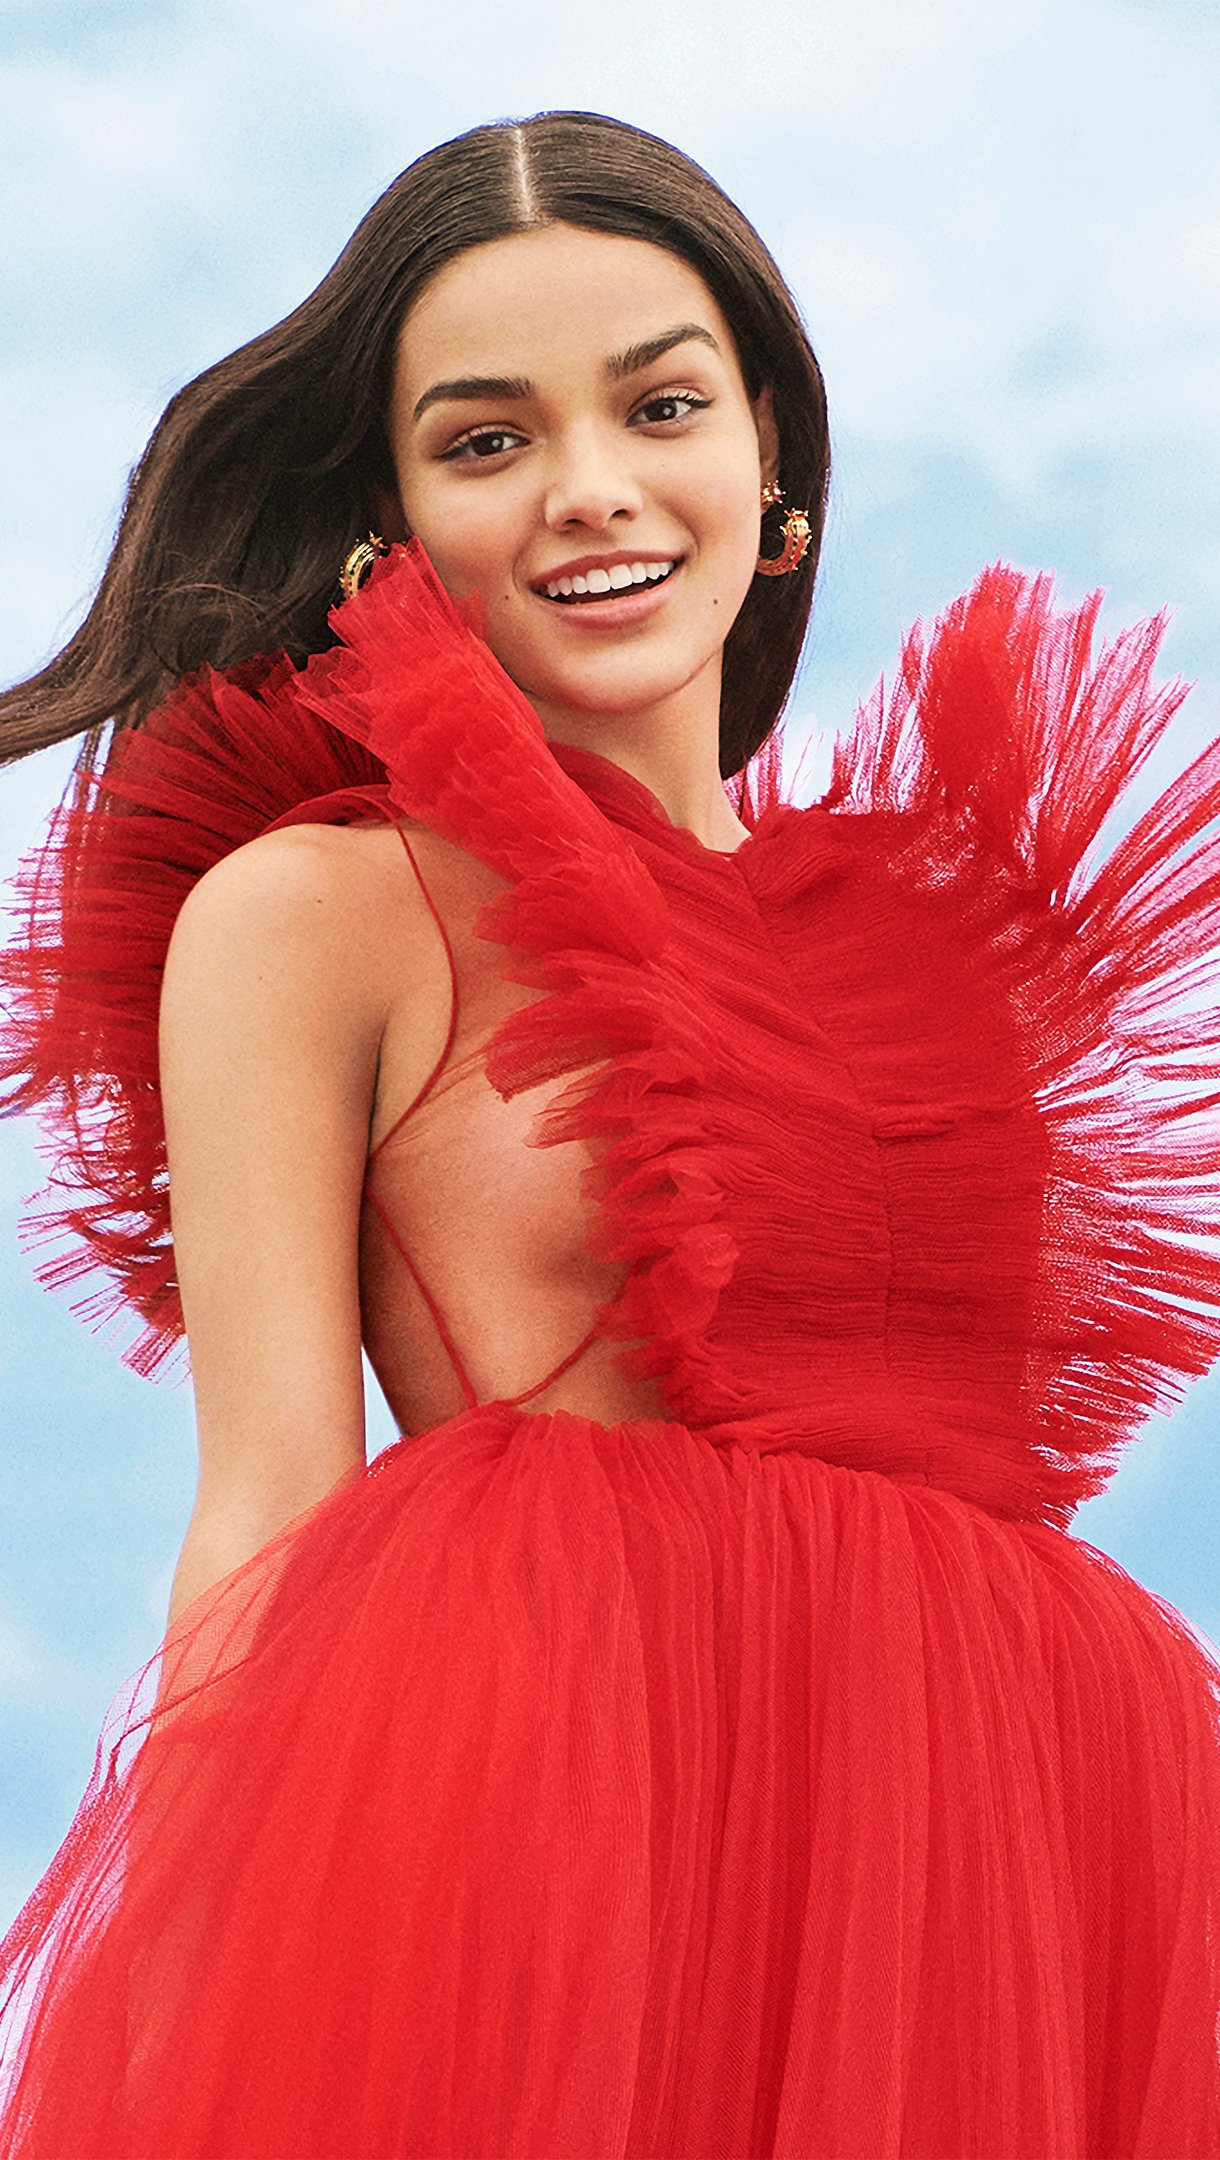 Wallpaper Rachel Zegler red dress Vertical